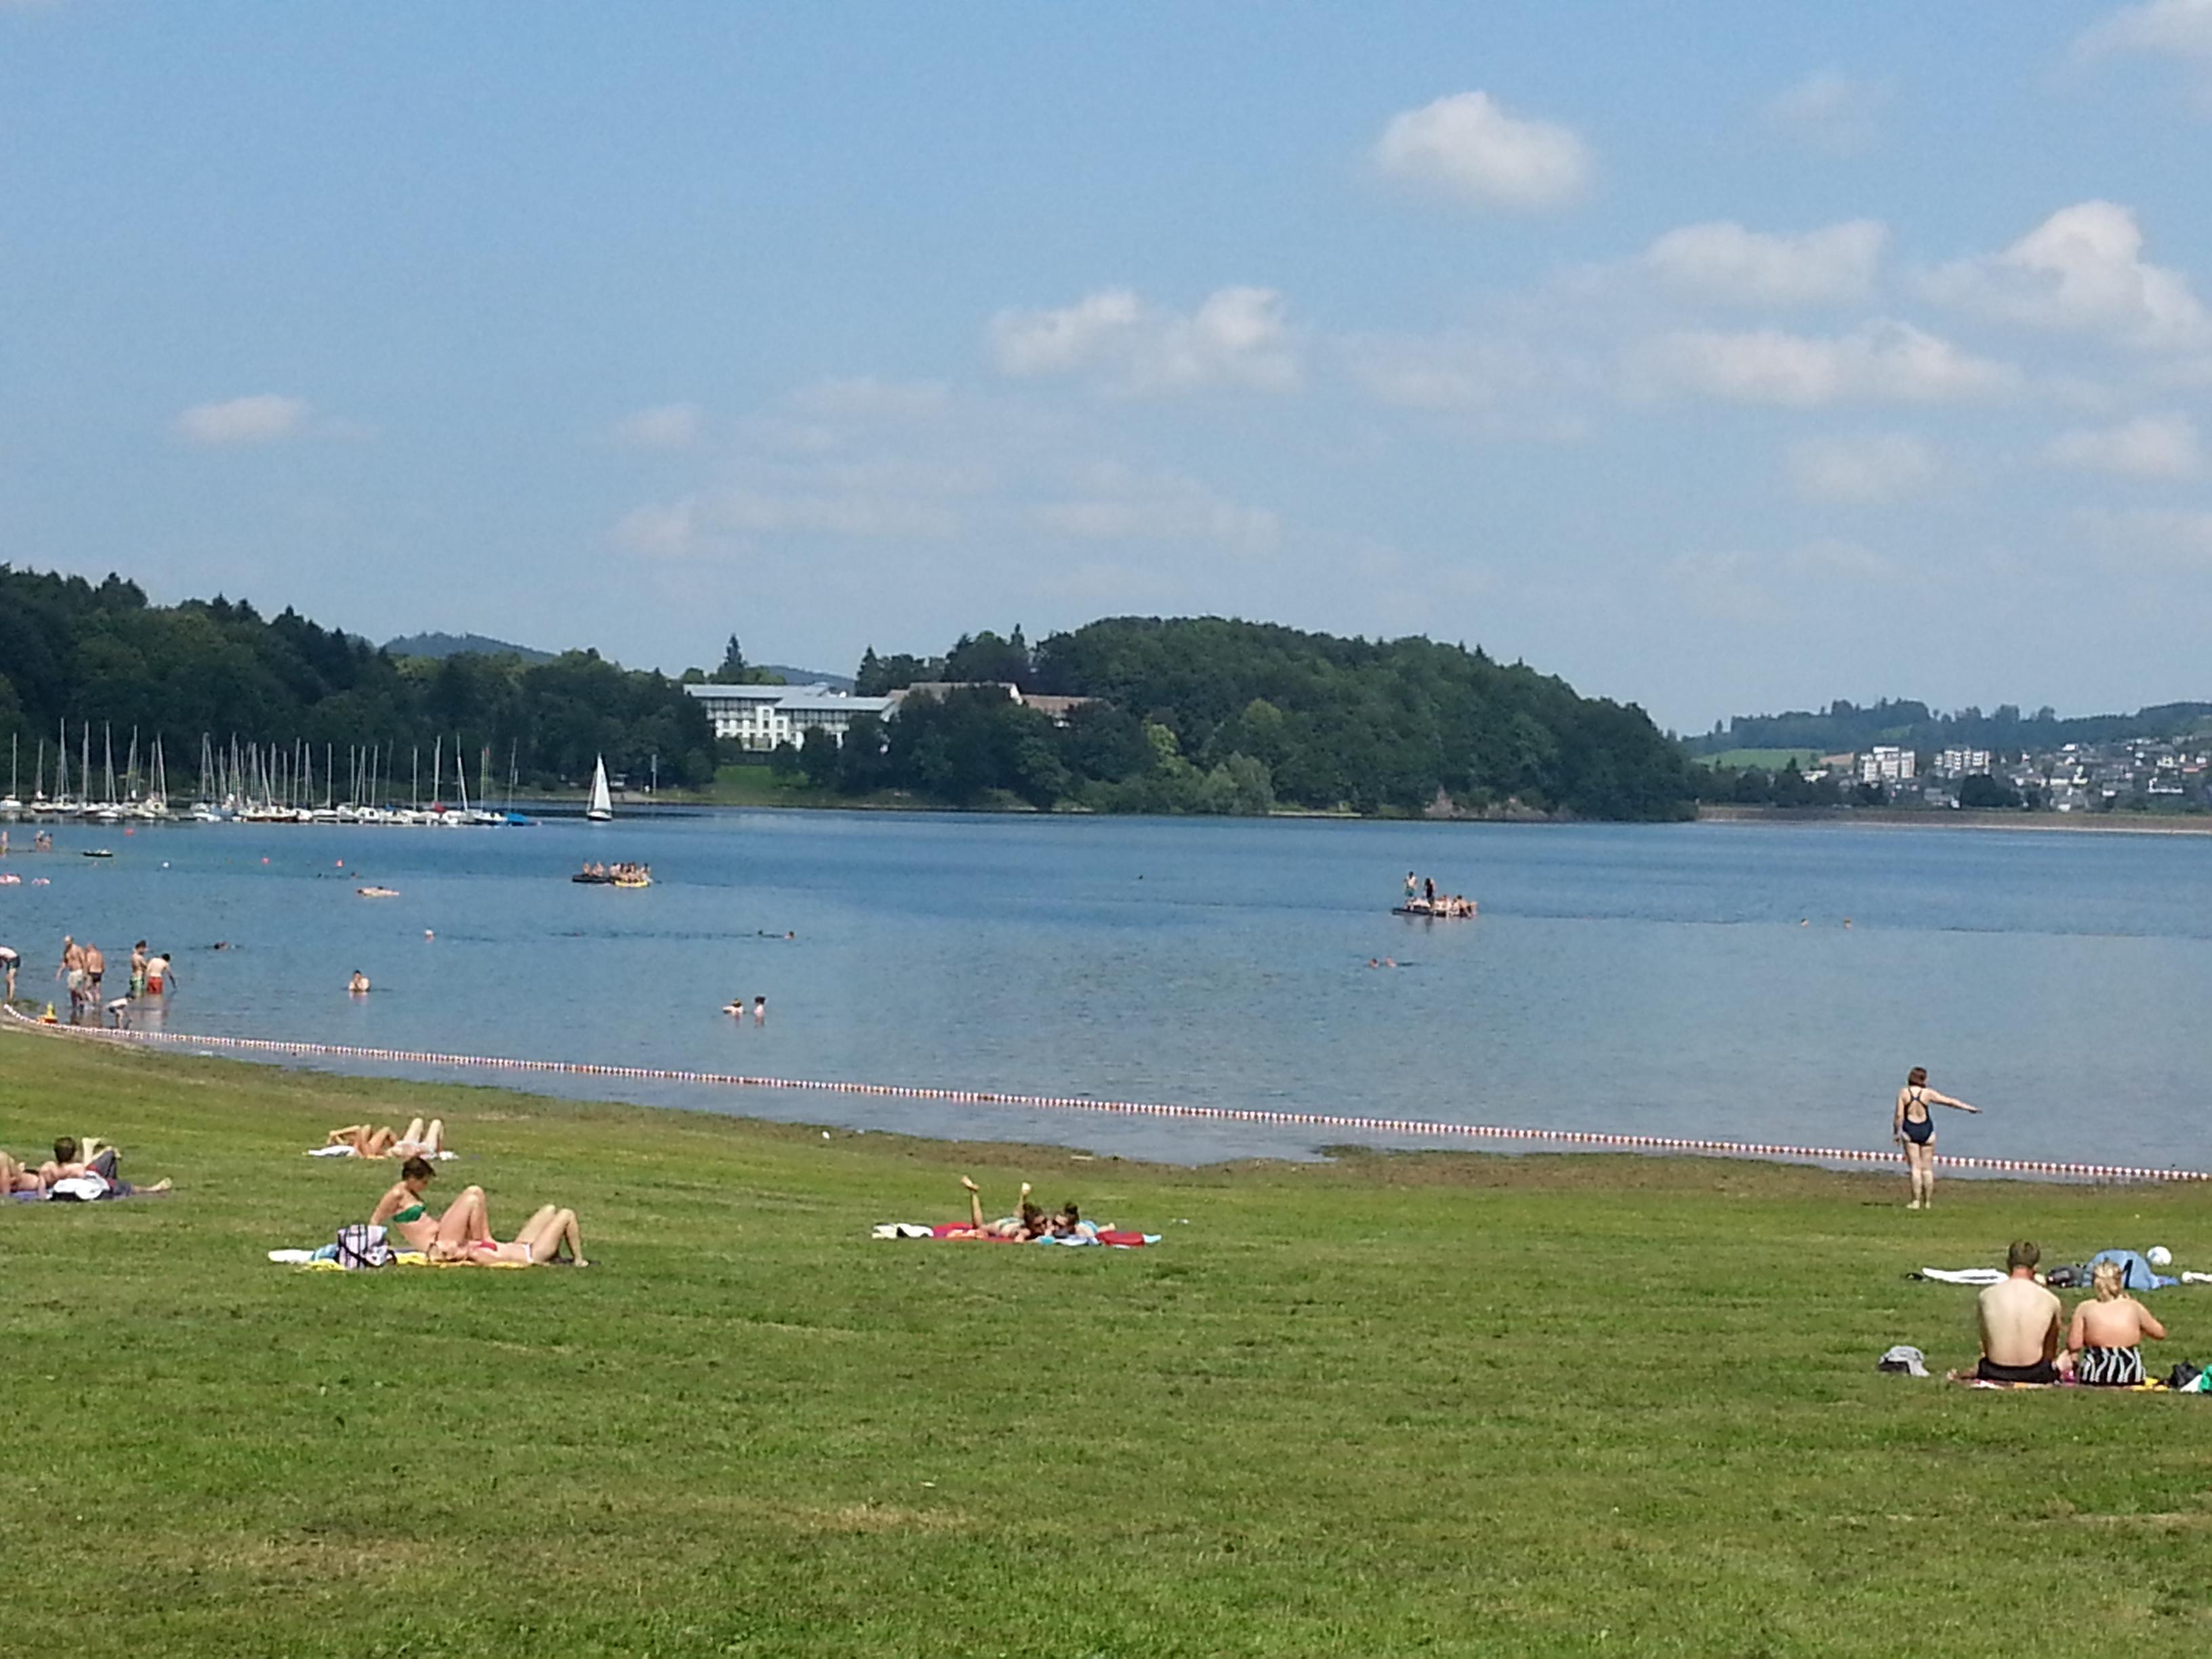 zomer in Sauerland